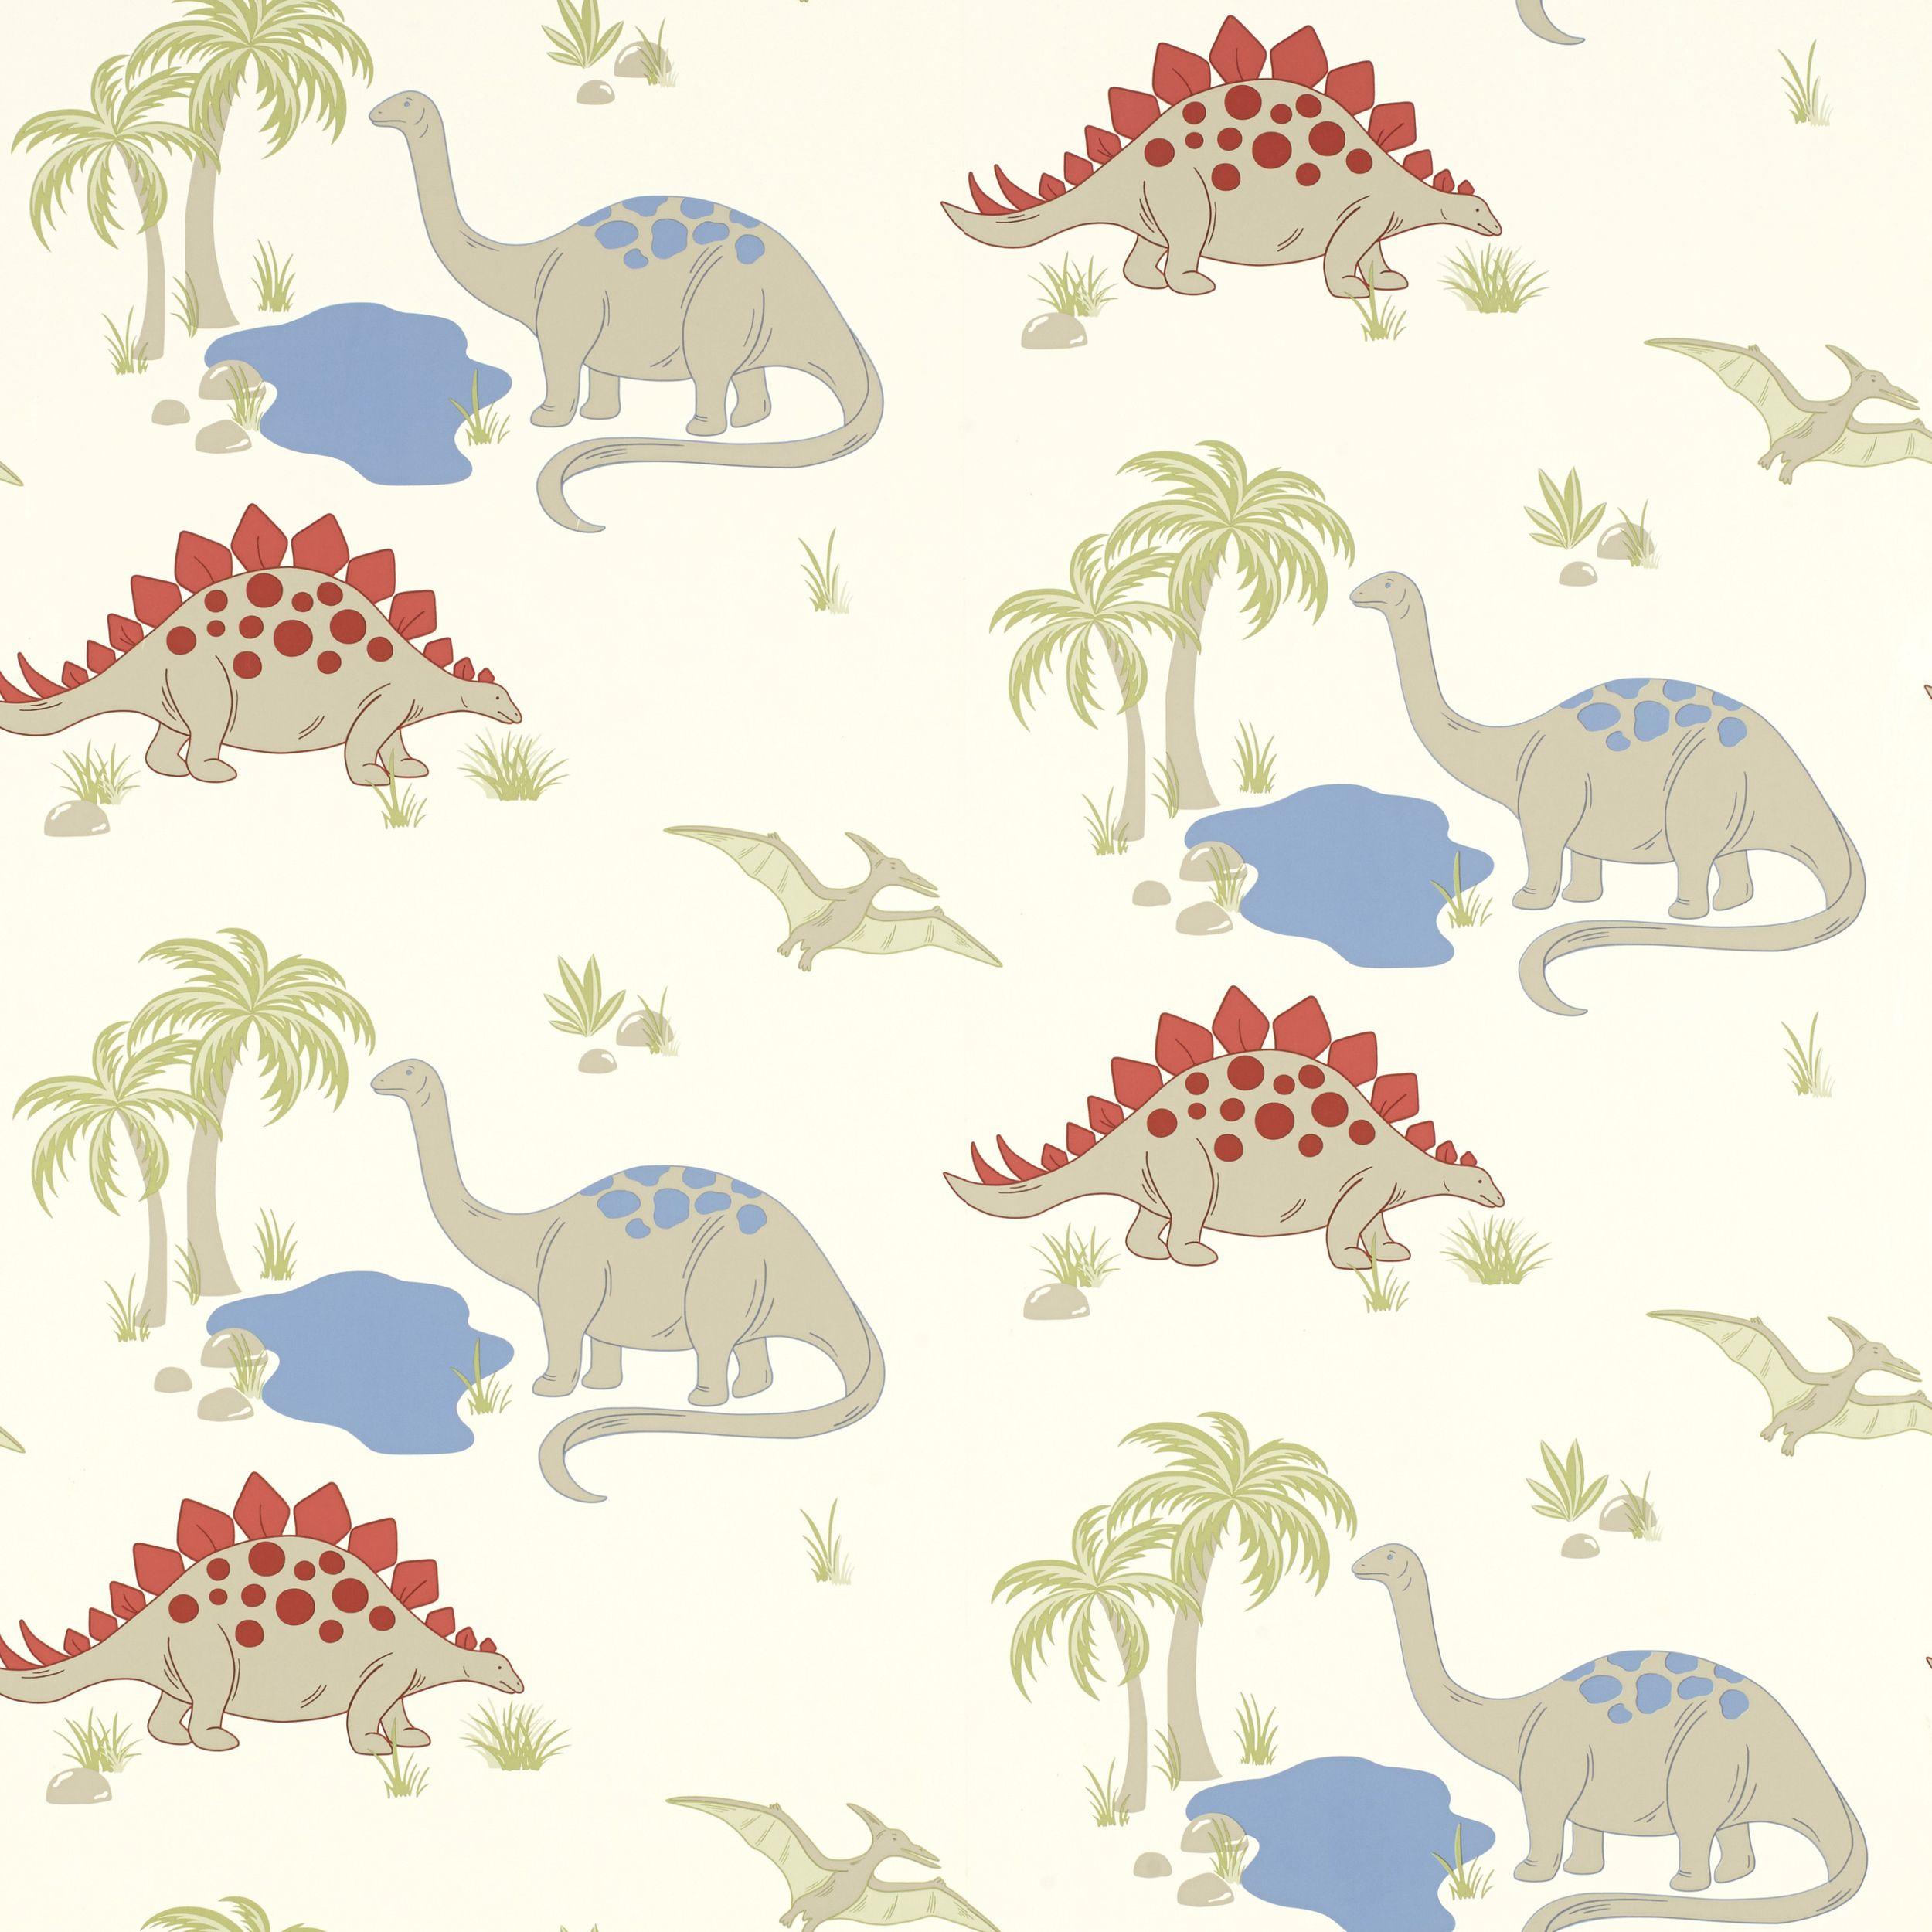 Kids Wallpaper For Bedroom For Kids Who Are Dinosaur Crazy Our New Dinosaur Wallpaper Makes